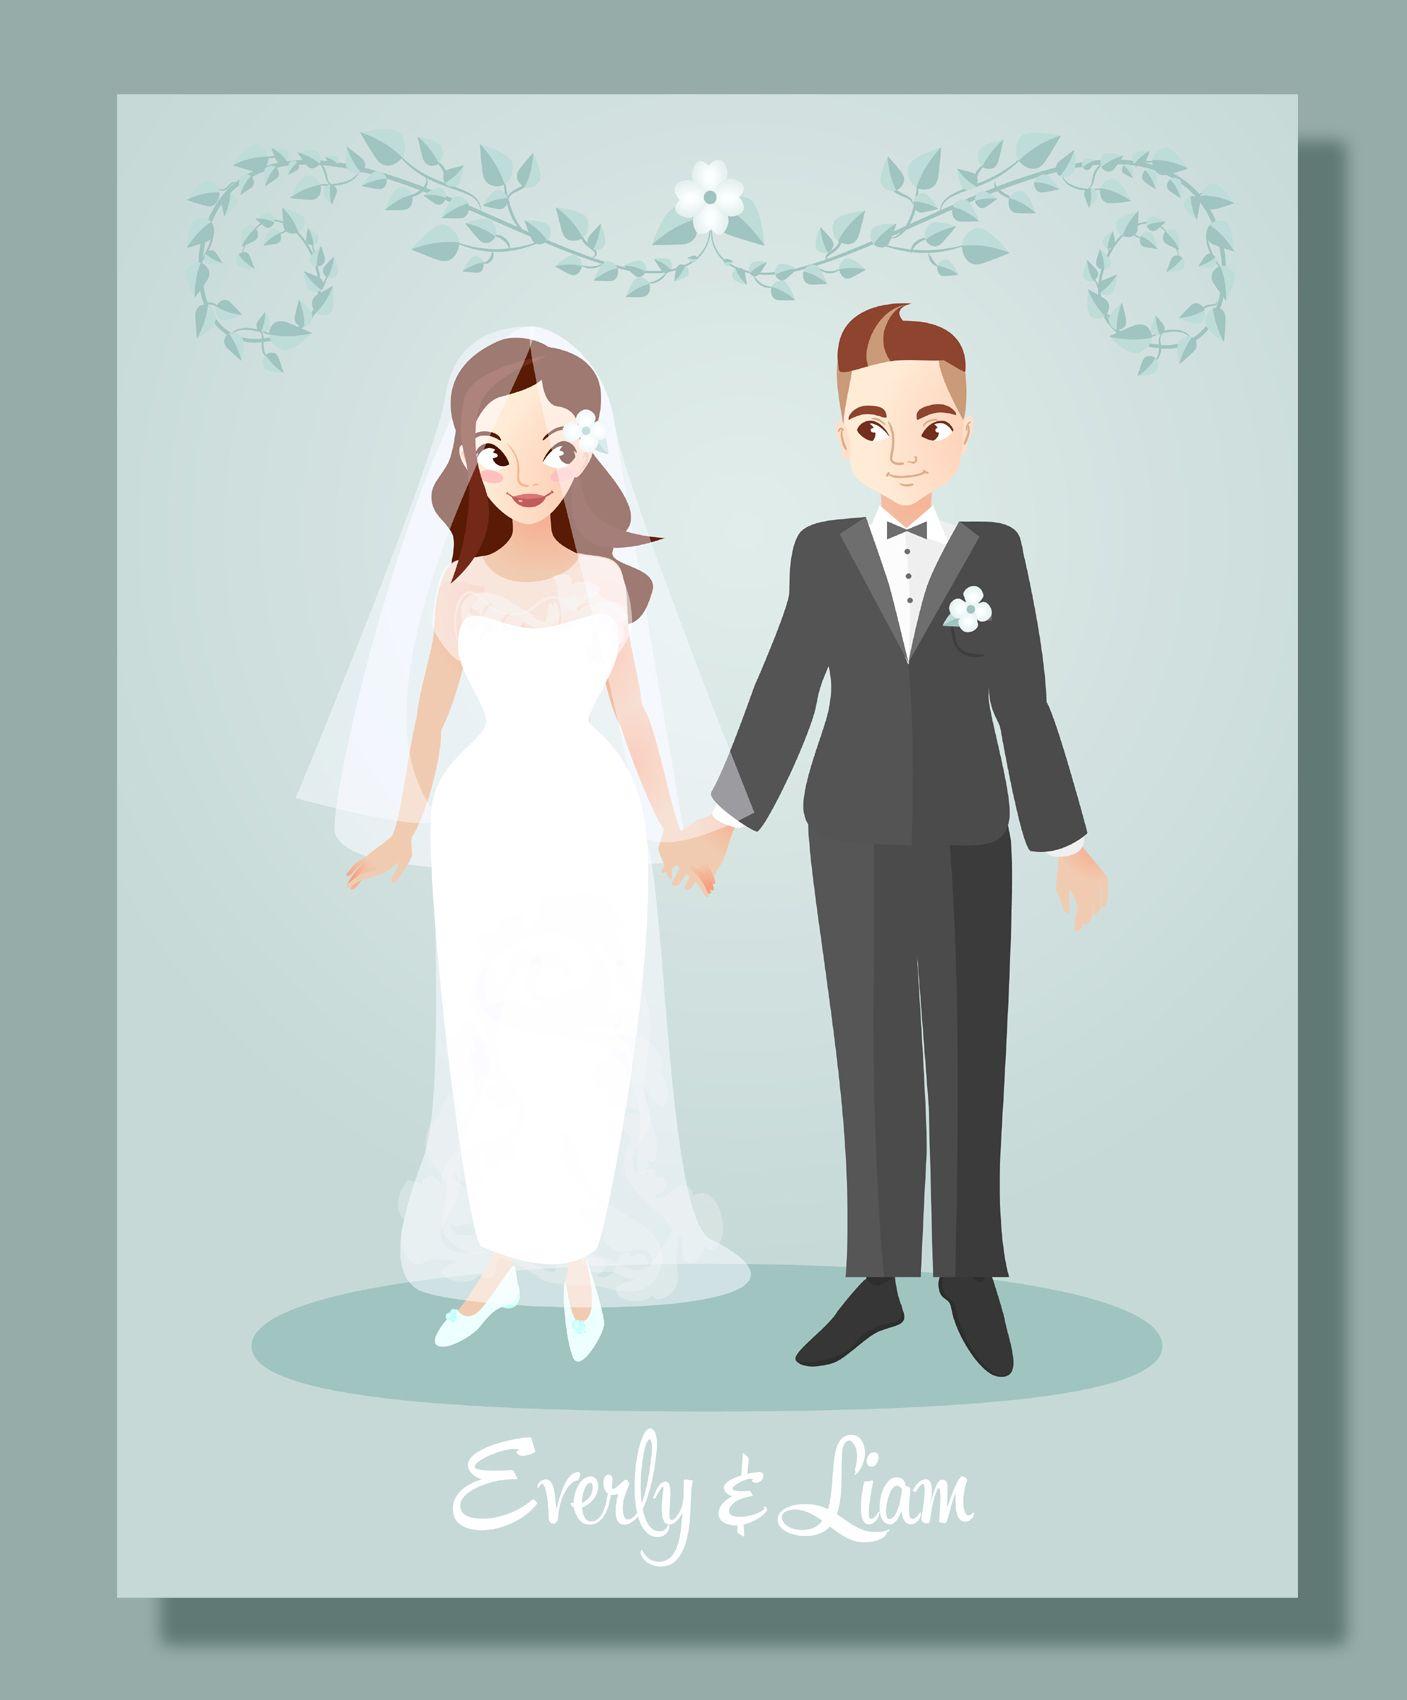 Custom Wedding Portrait Illustration Bride Gift Ideas Groom Couplecustom Portraitcustom